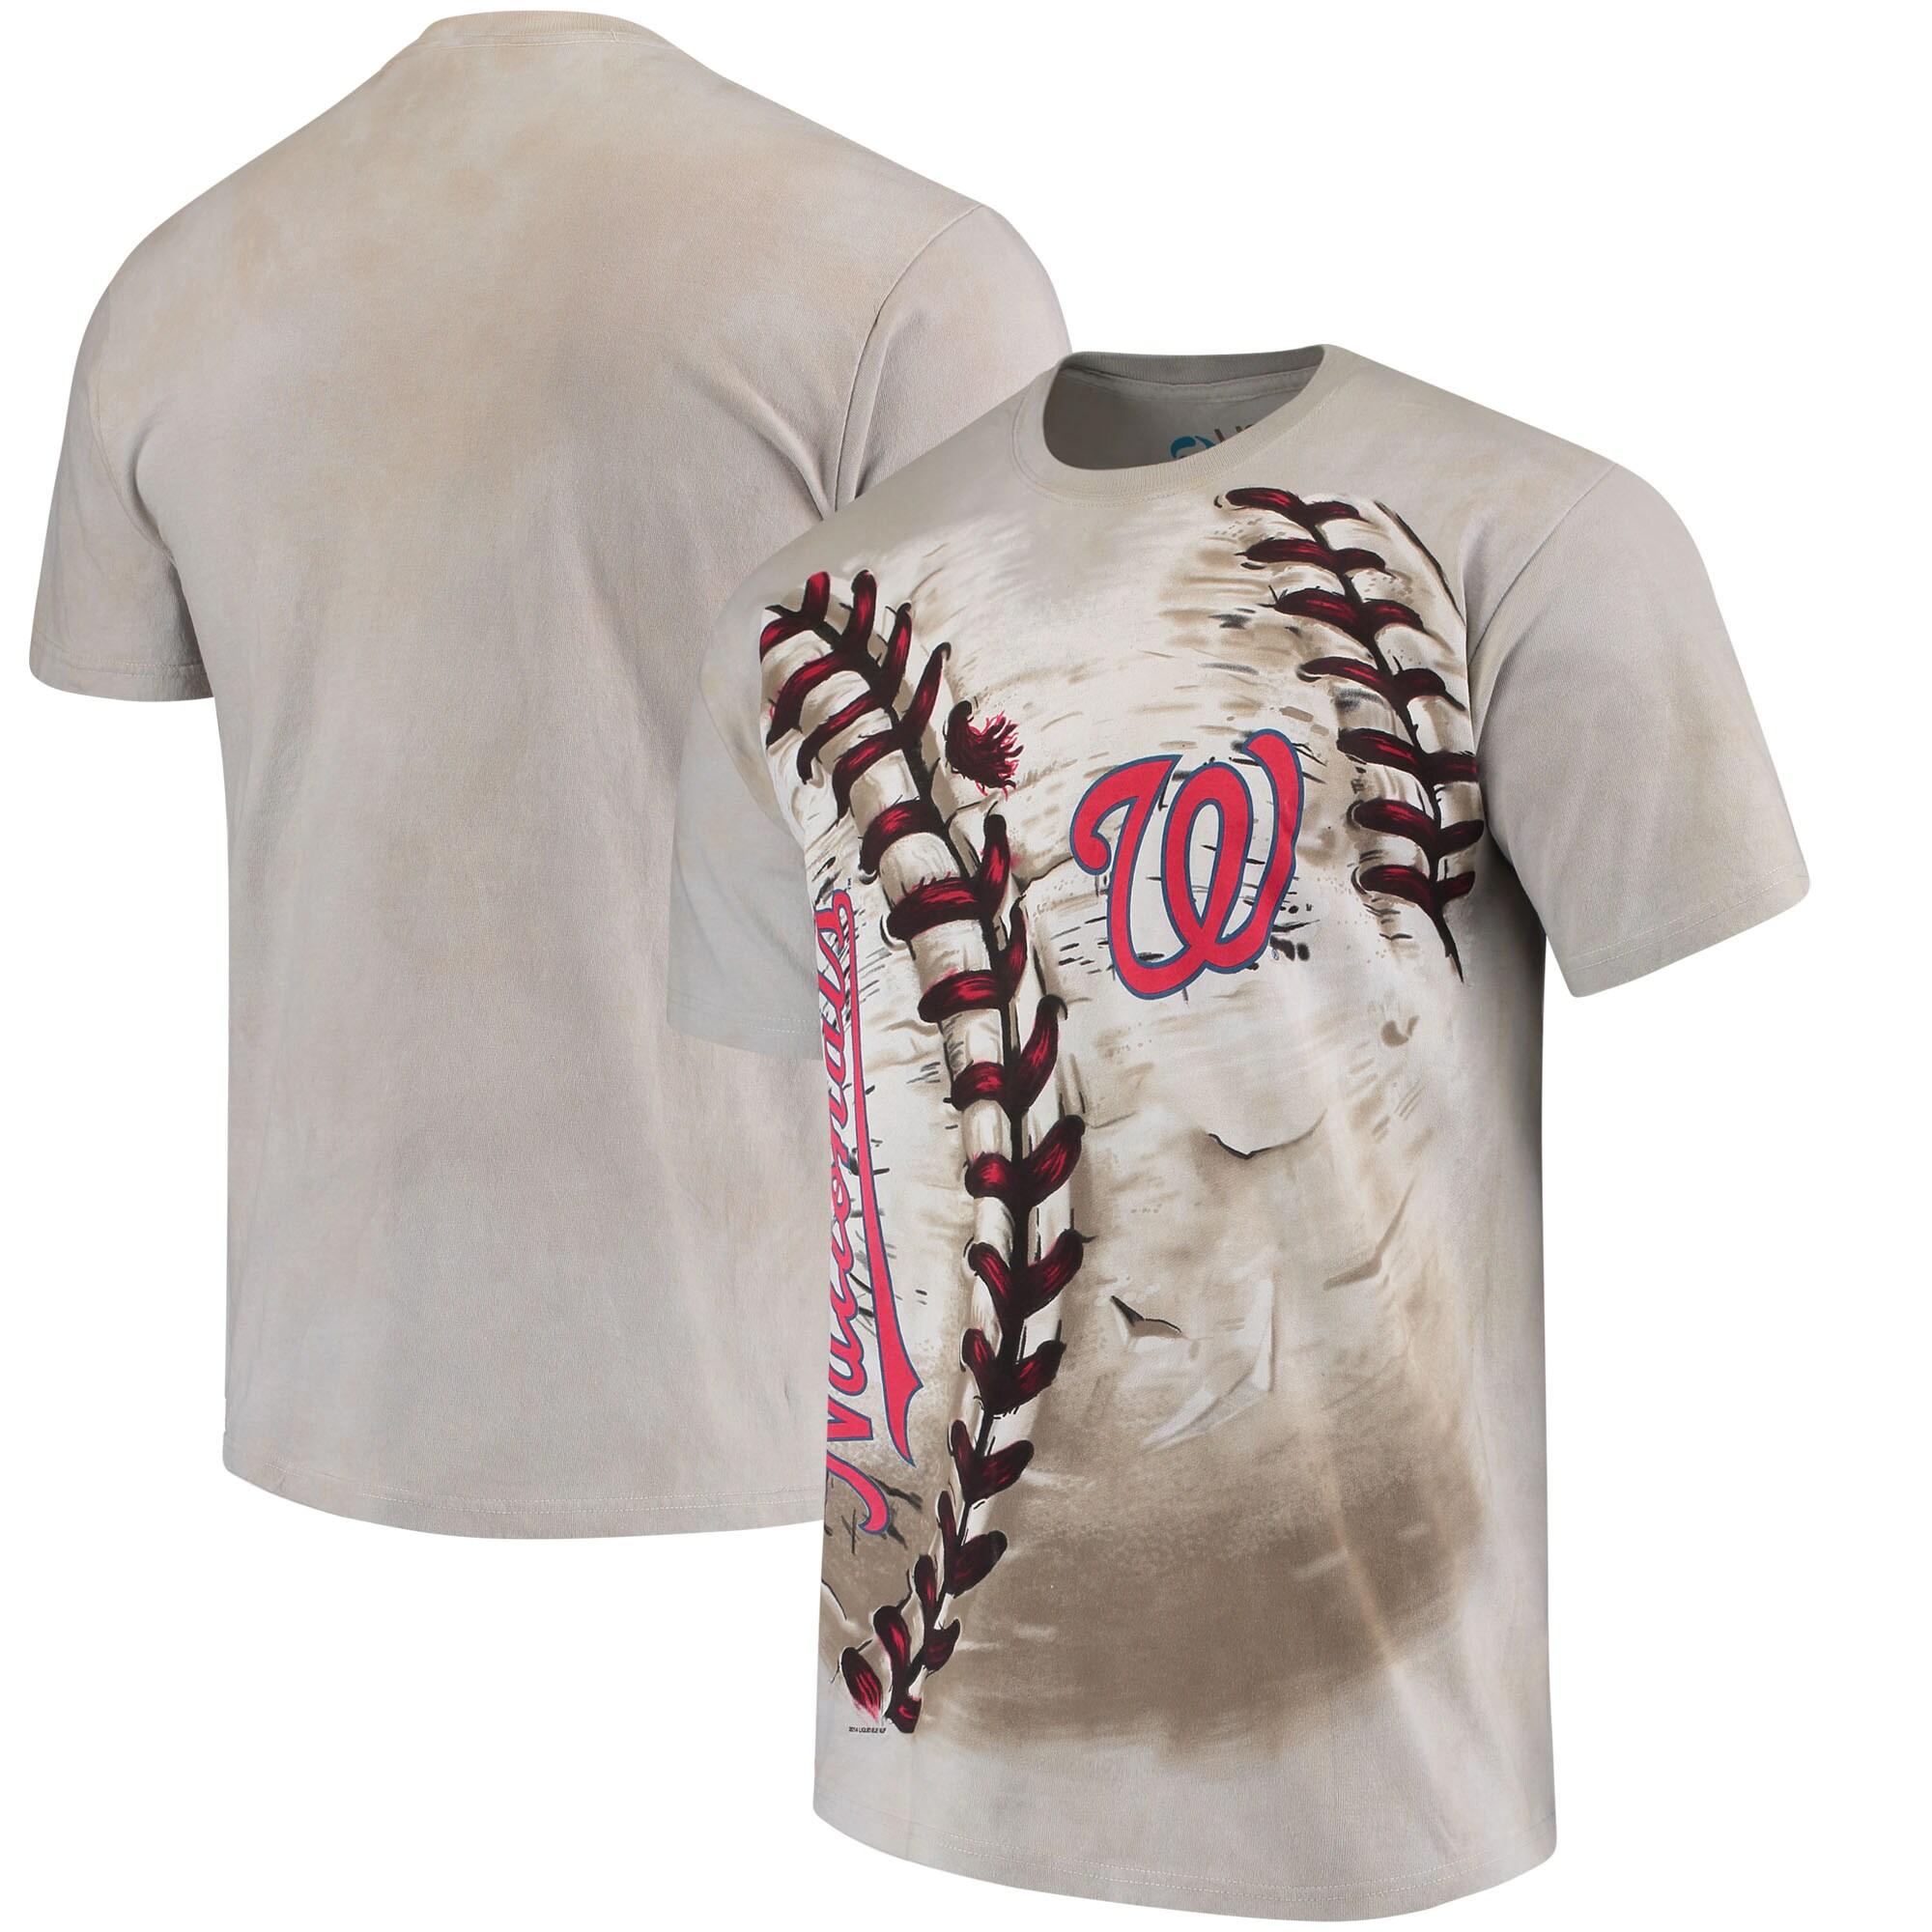 Washington Nationals Hardball Tie-Dye T-Shirt - Cream